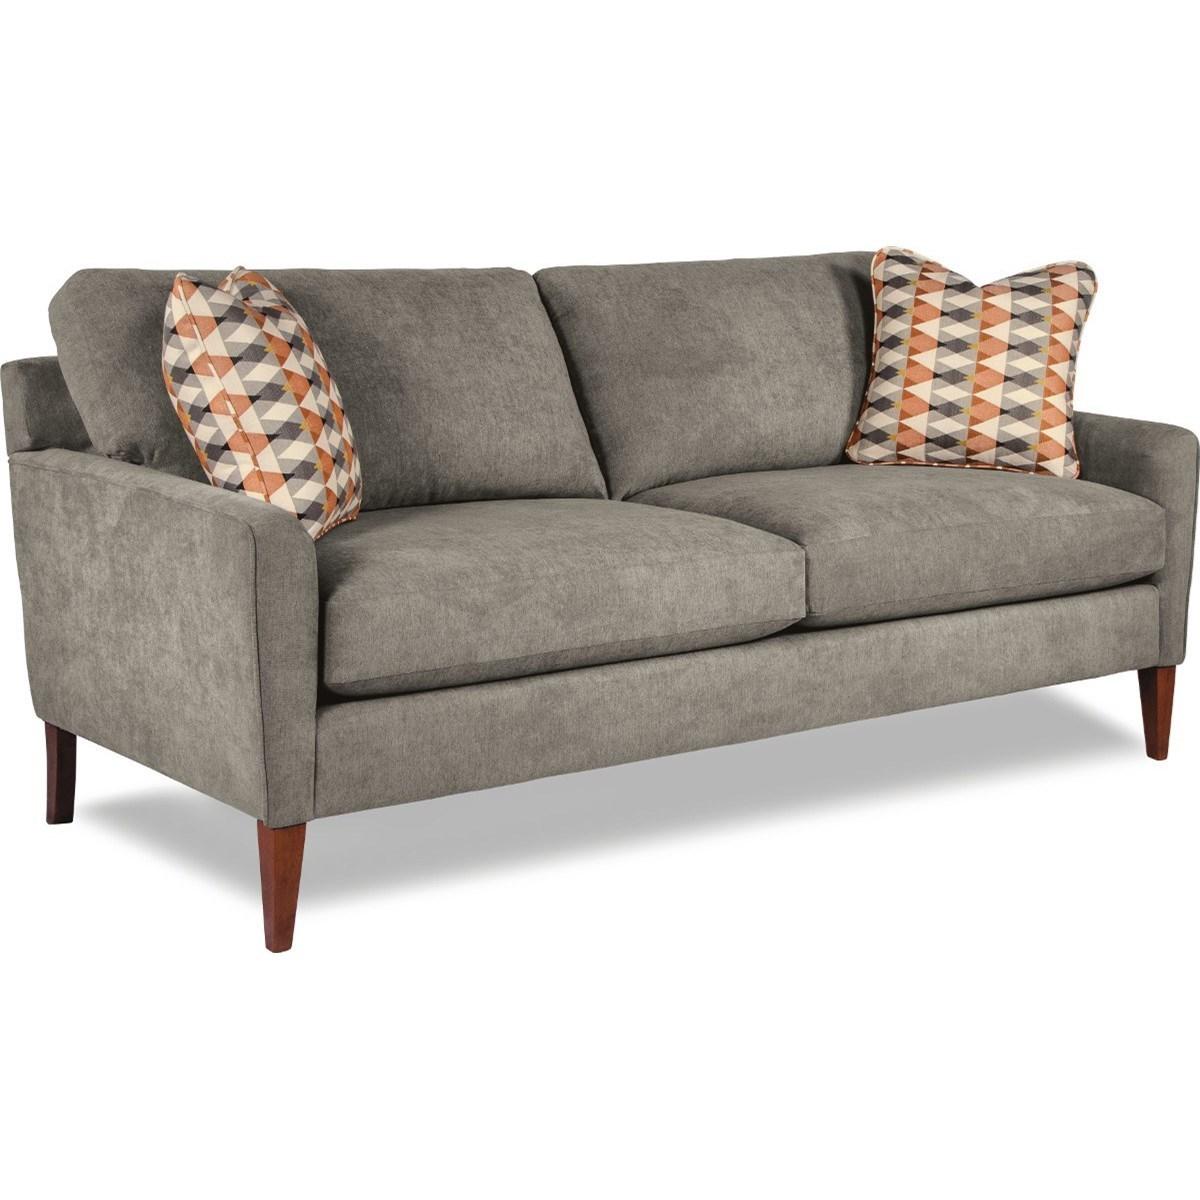 La-Z-Boy McKinney 610680 Mid-Century Modern Sofa | Coconis Furniture ...